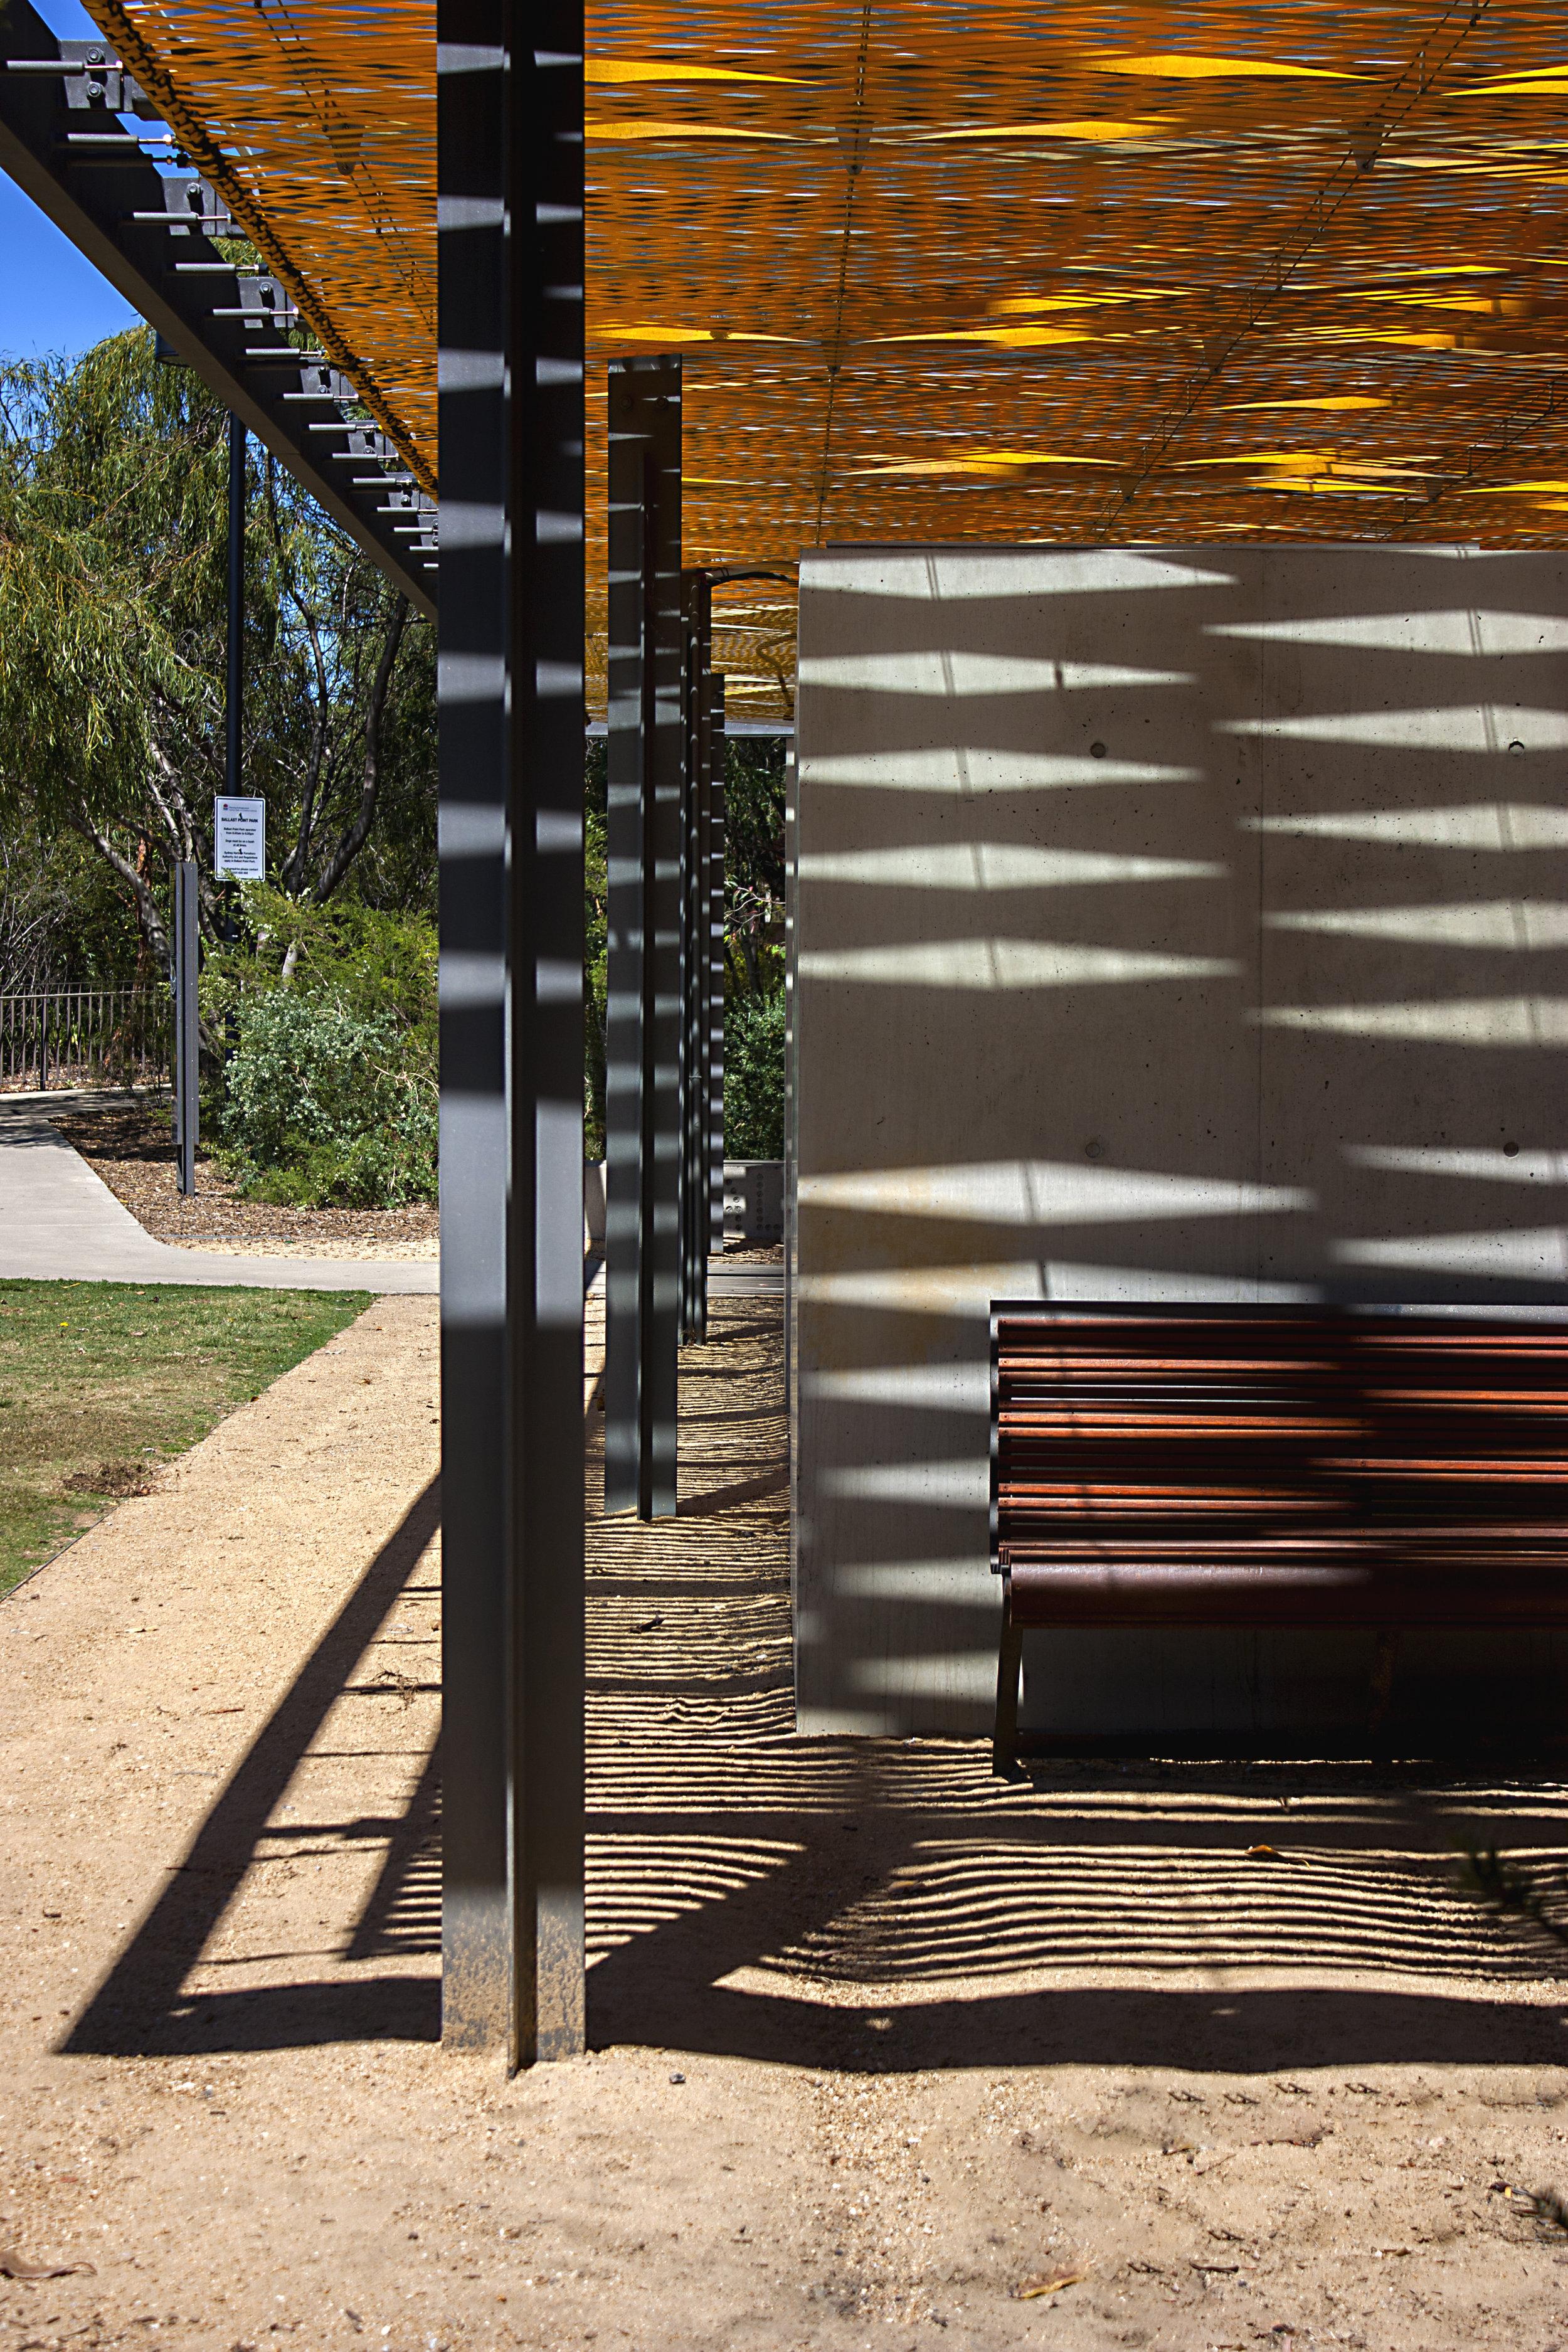 Australia_Sydney_Ballast Point Park_Bathroom Structure.jpg